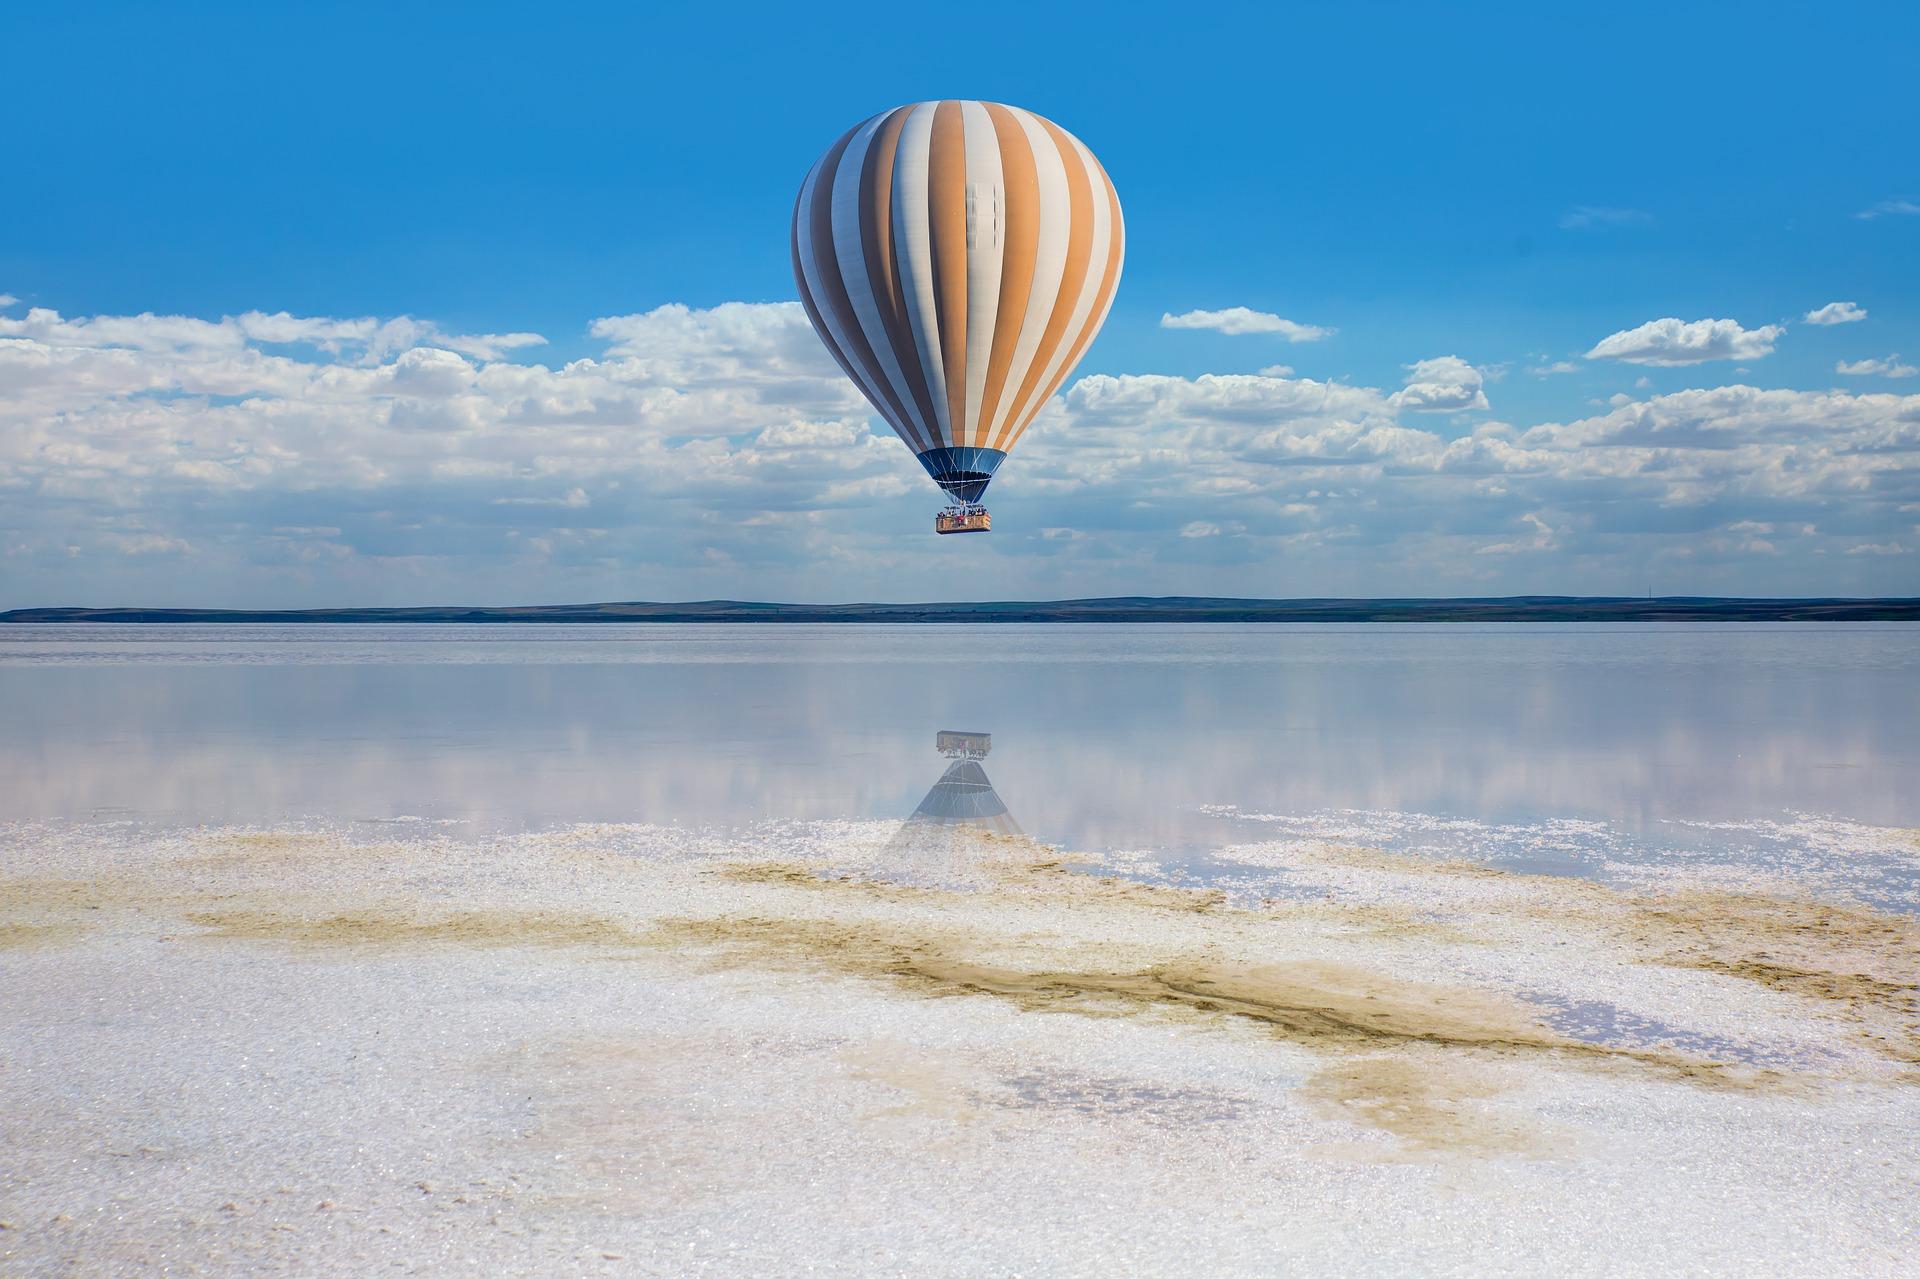 Turquie_plage_montgolfi%C3%A8re_CC0.jpg?1545562258